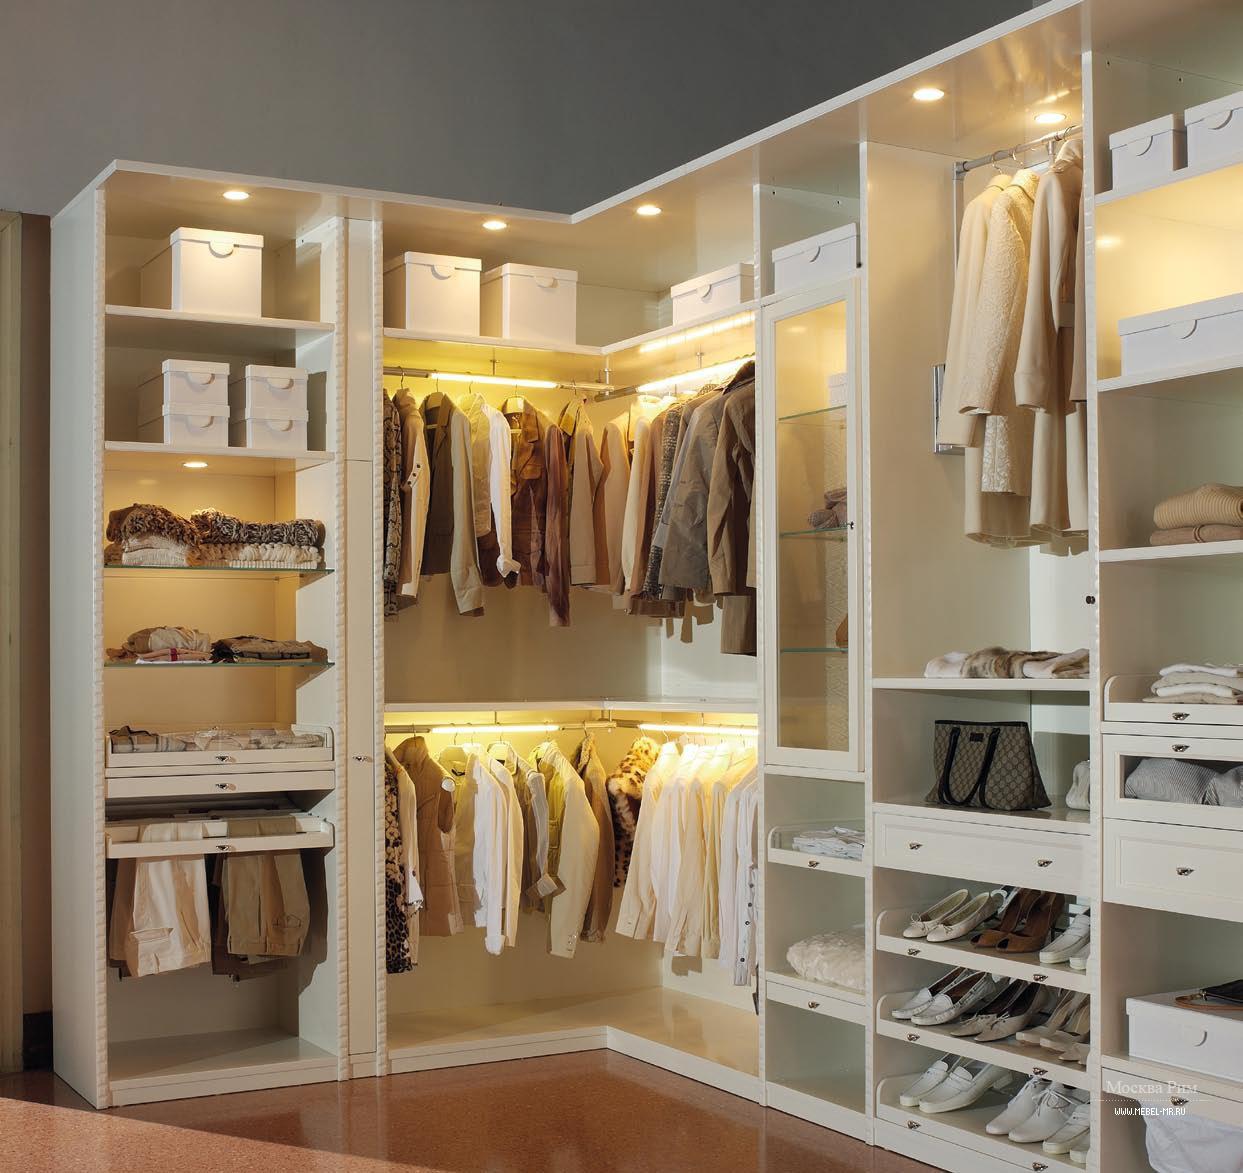 шкворни подсветка в гардеробной комнате фото описание процесса